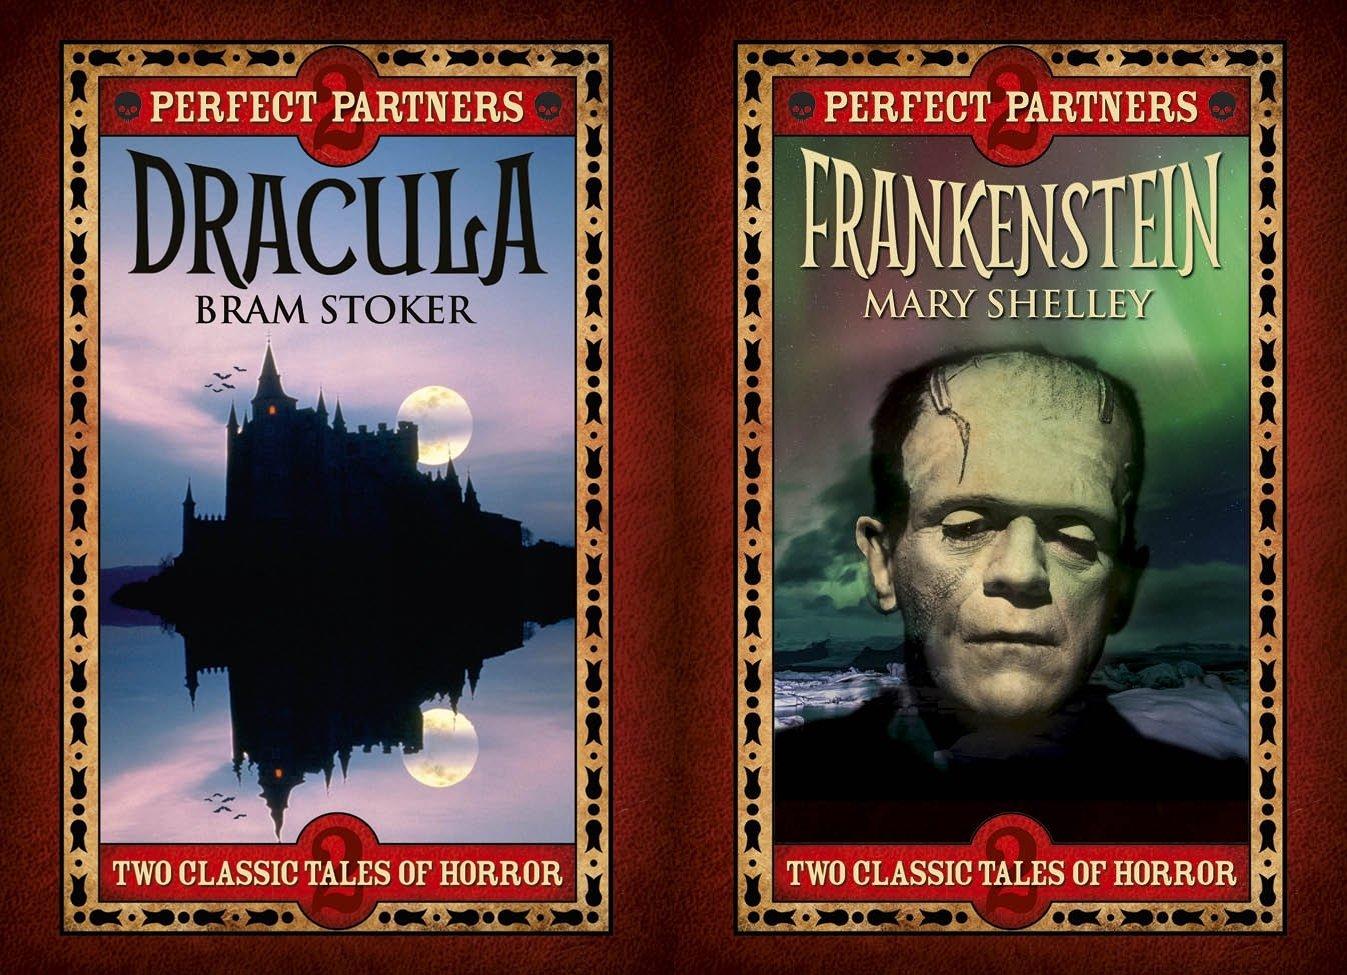 Dracula & Frankenstein: Slip-case Edition (Perfect partners): Bram Stoker,  Mary Shelley: 9781784282912: Amazon.com: Books